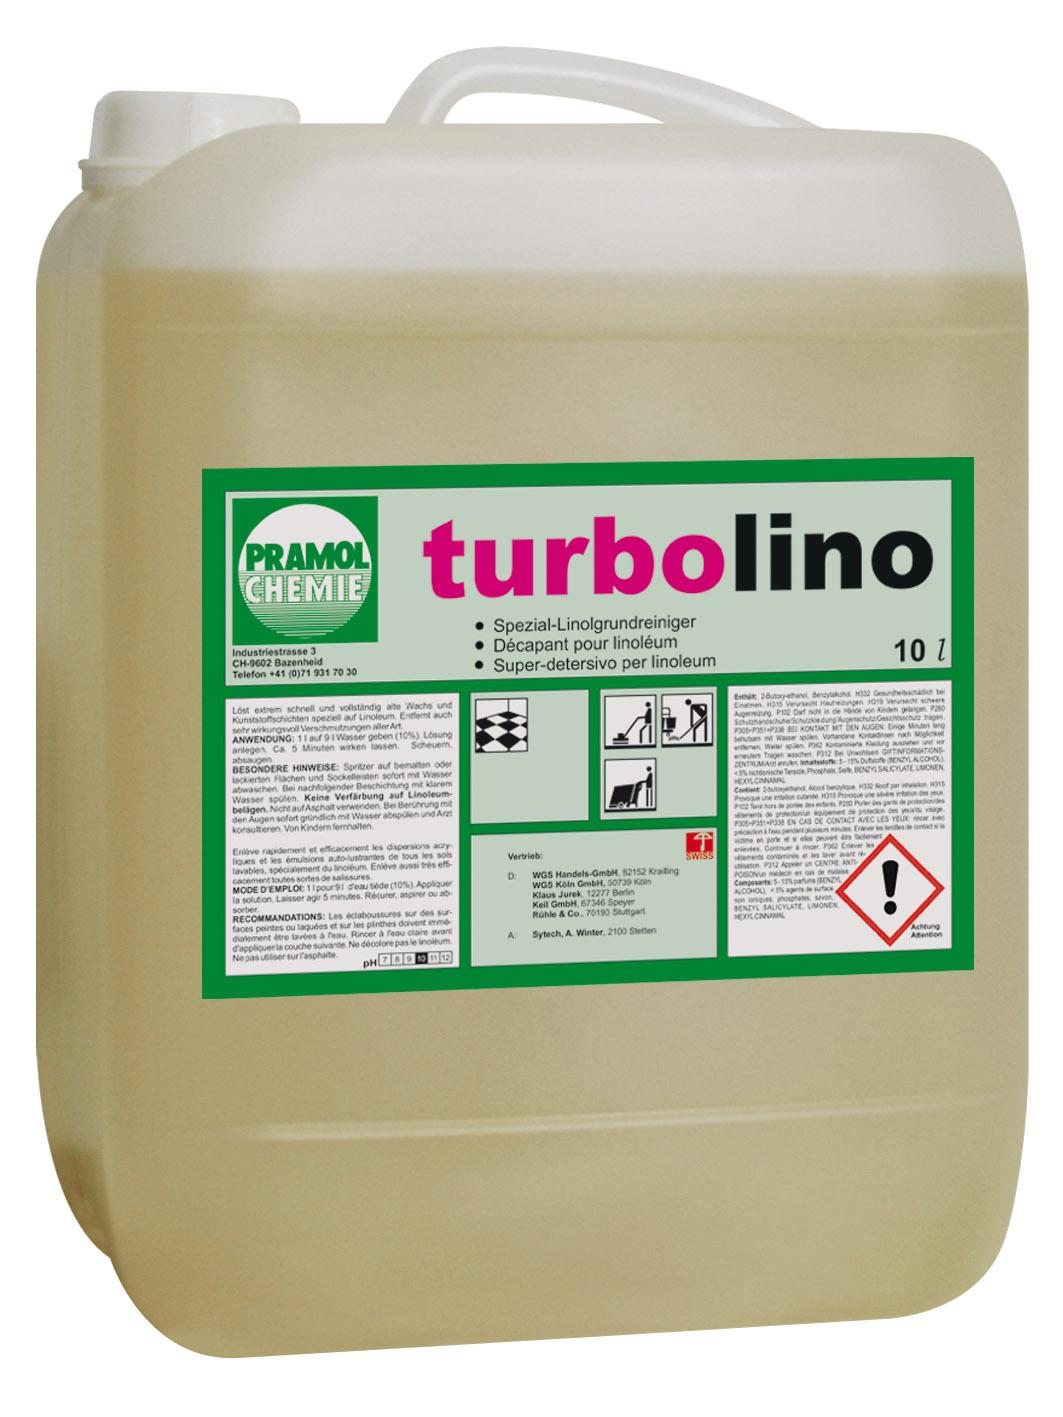 Pramol turbolino Grundreiniger, für Linoleumböden, 10 Liter